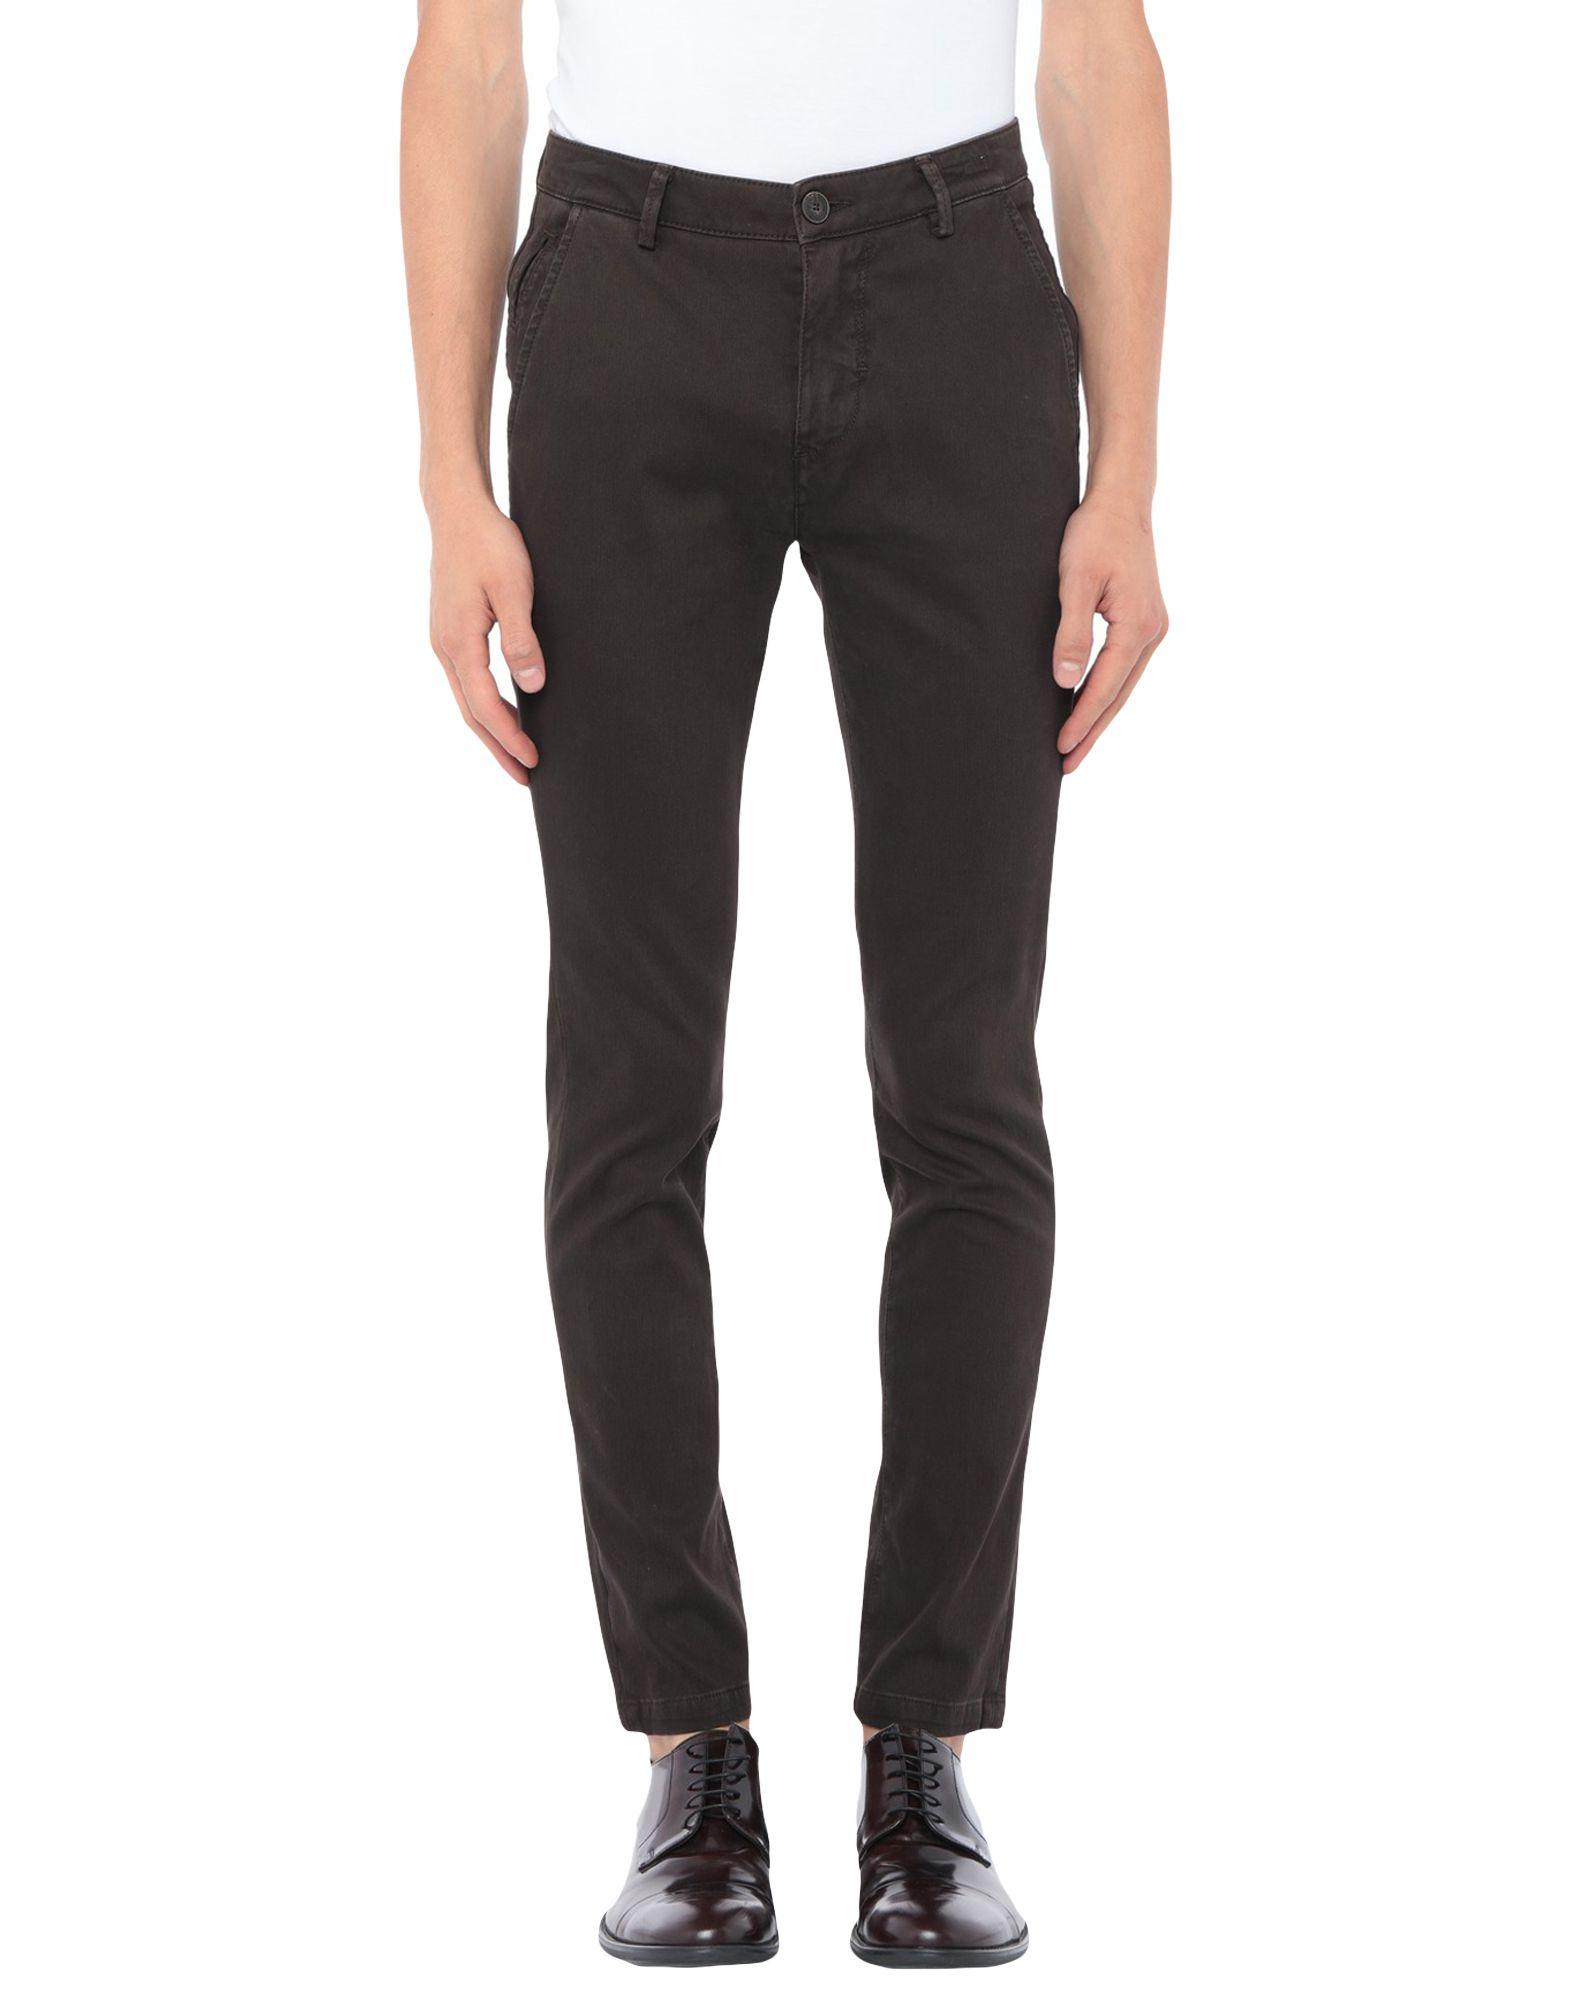 YAN SIMMON Повседневные брюки 1pcs lot sd6830 6830 dip 8 in stock